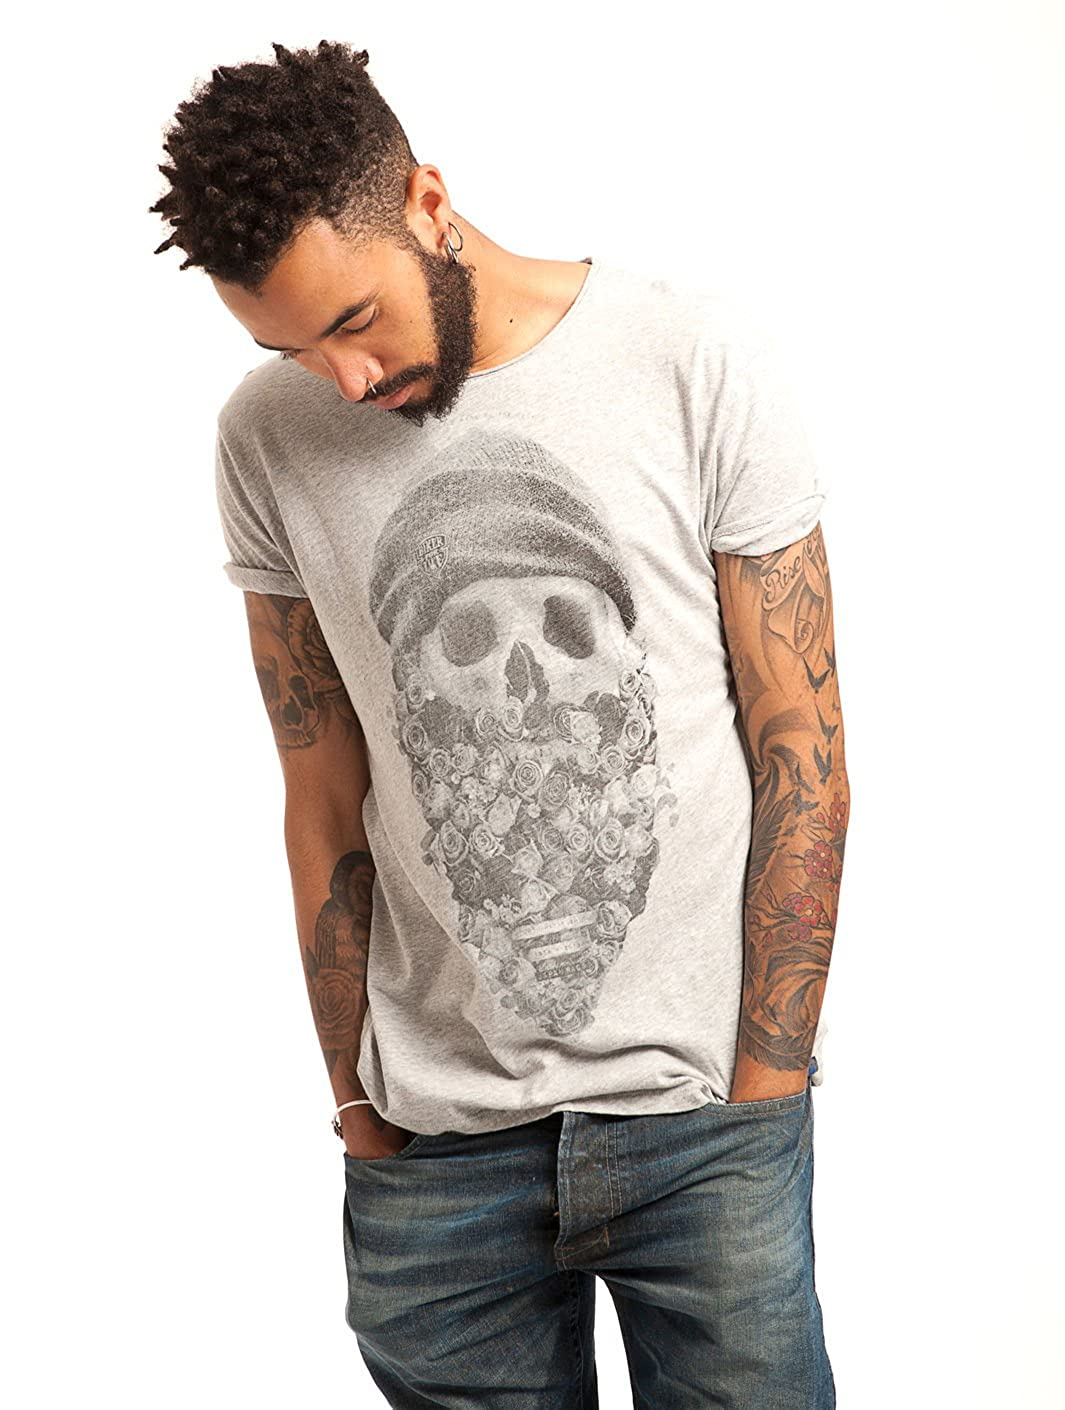 À Rags Manches T Loubard Homme Melange Xl Japan Shirt Courtes Grey rCxEdWQBoe